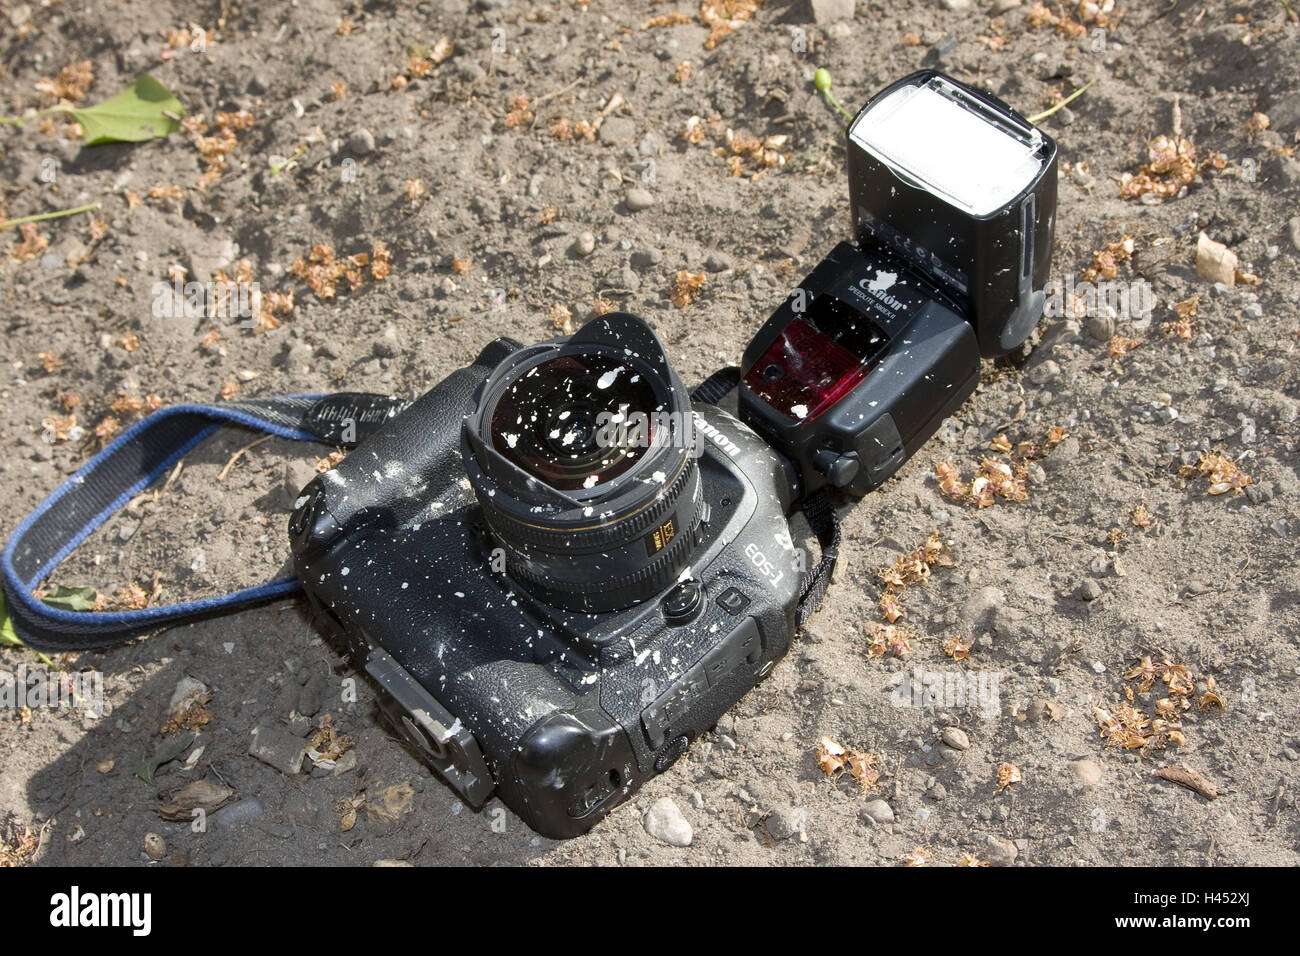 Reflex camera, Aufsteckblitz, Sand, lie, dirtily, camera, camera, professional camera, lens, fish-eye lens, Aufsteckblitz, - Stock Image